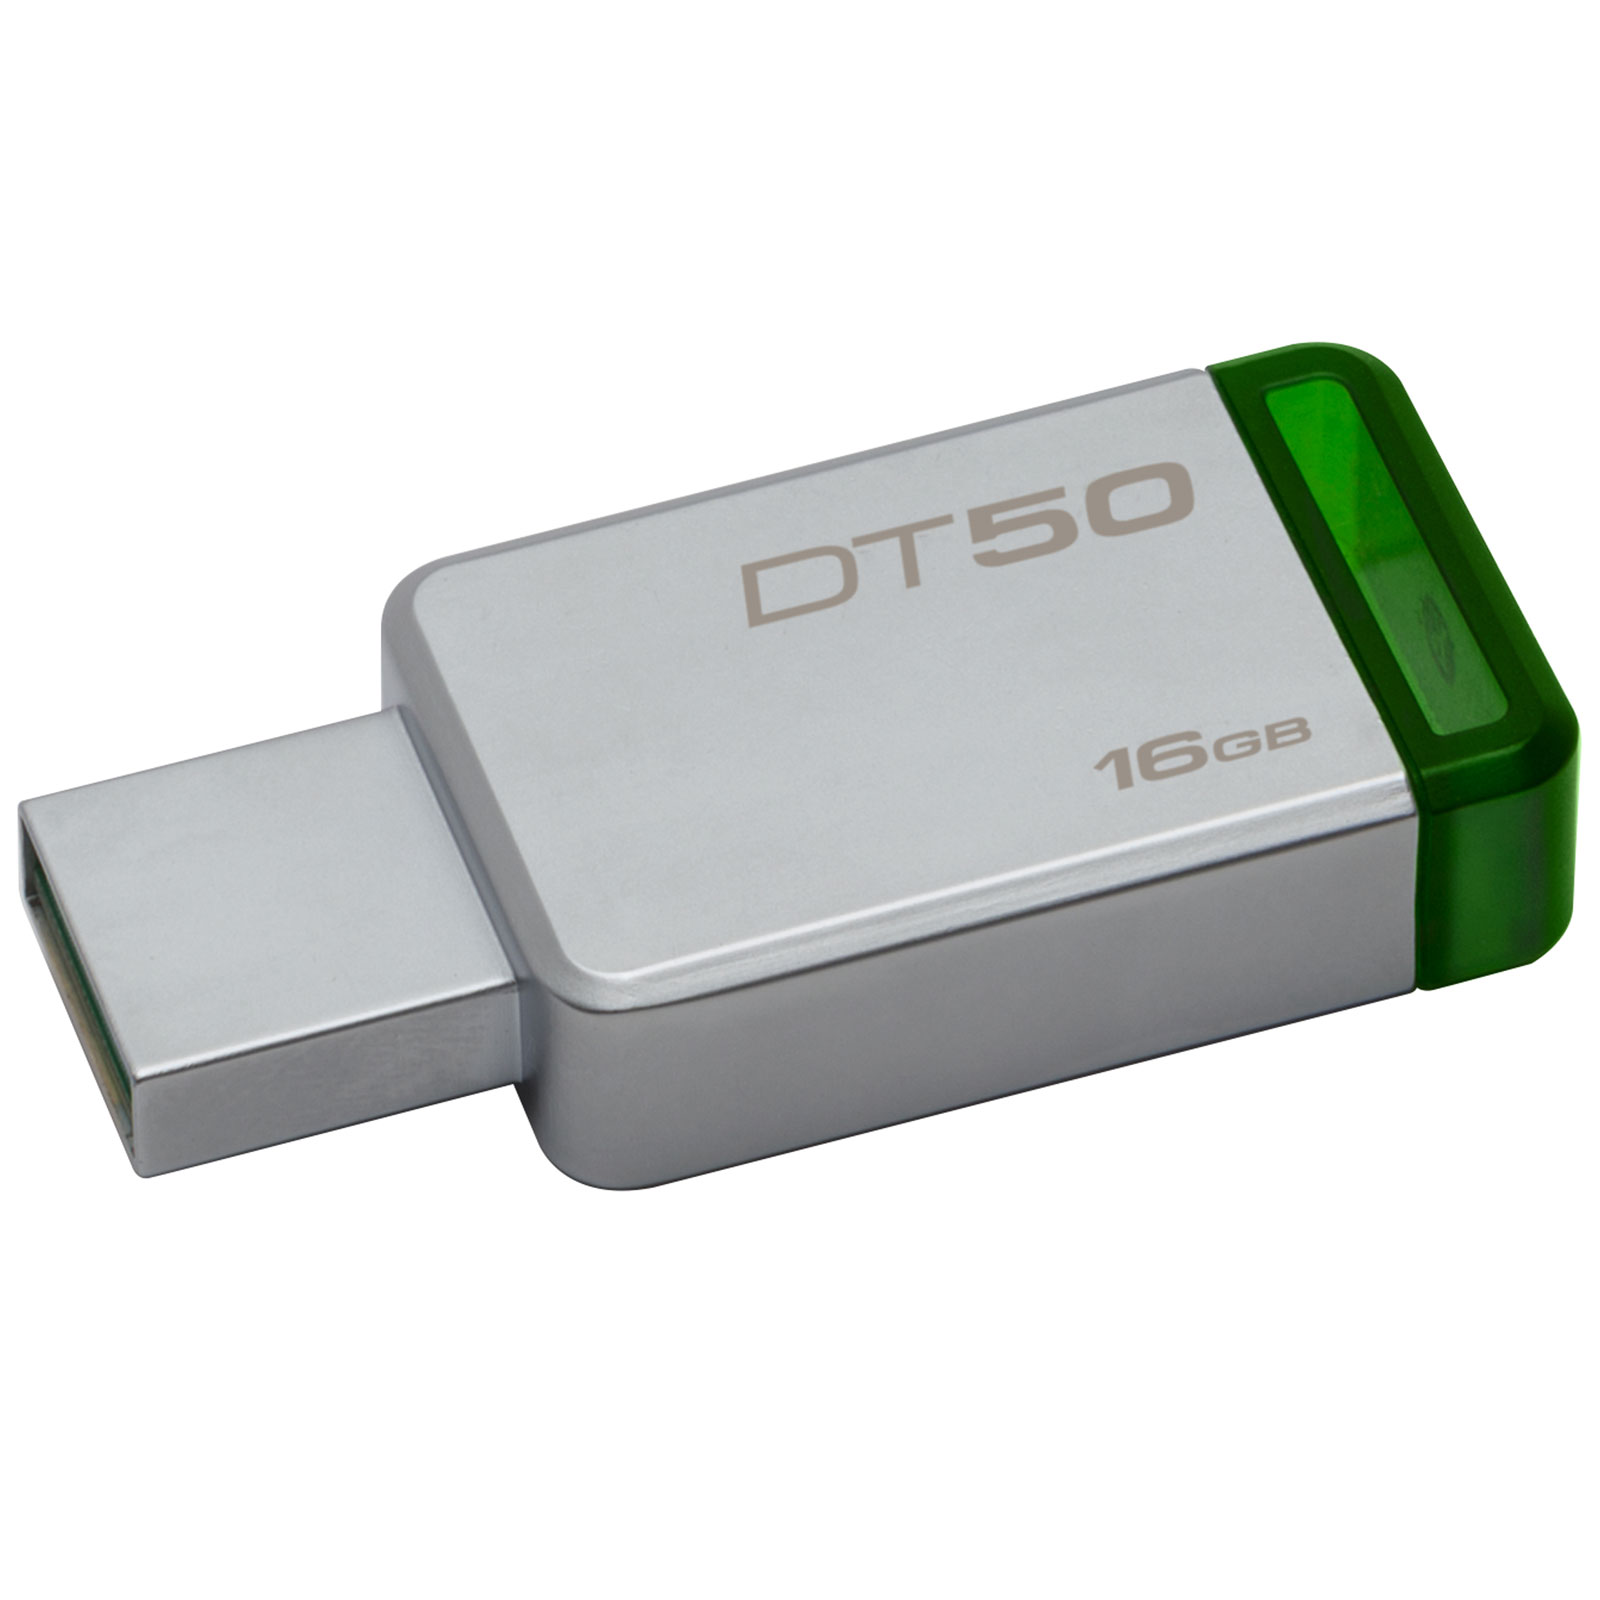 Clé USB Kingston DataTraveler 50 16 Go Clé USB 3.0 16 Go (garantie constructeur 5 ans)